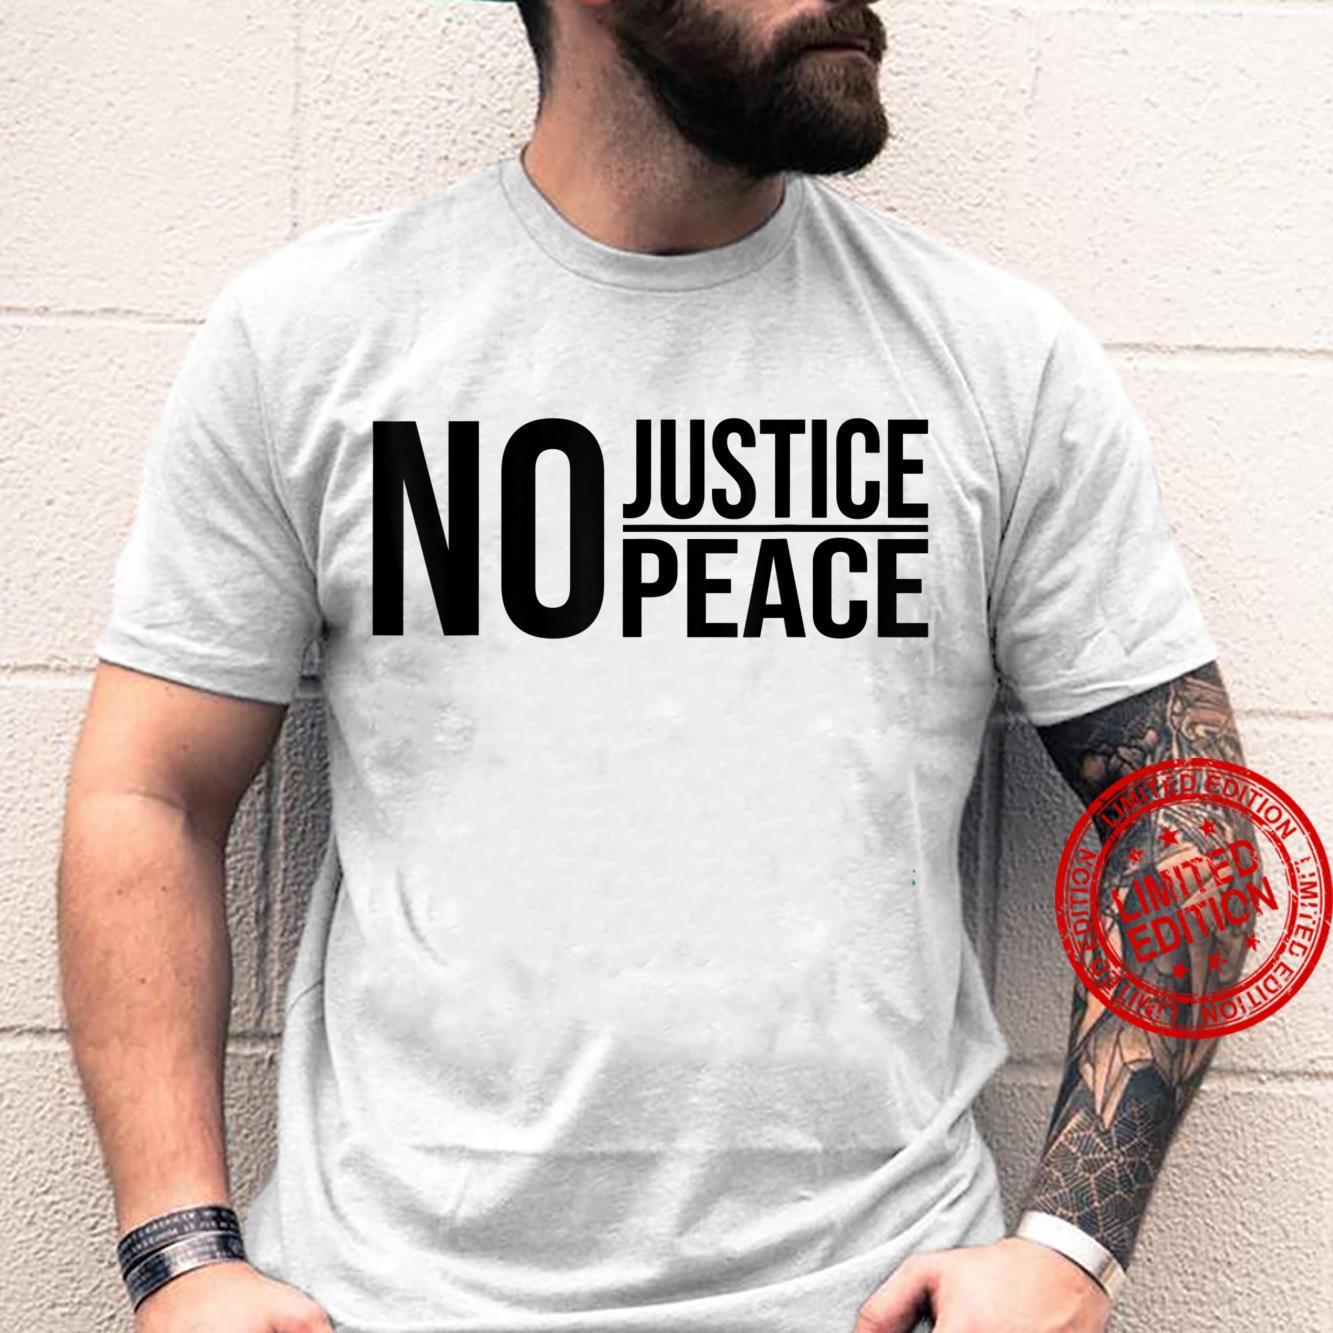 NO JUSTICE NO PEACE SOCIAL JUSTICE PROTEST Shirt